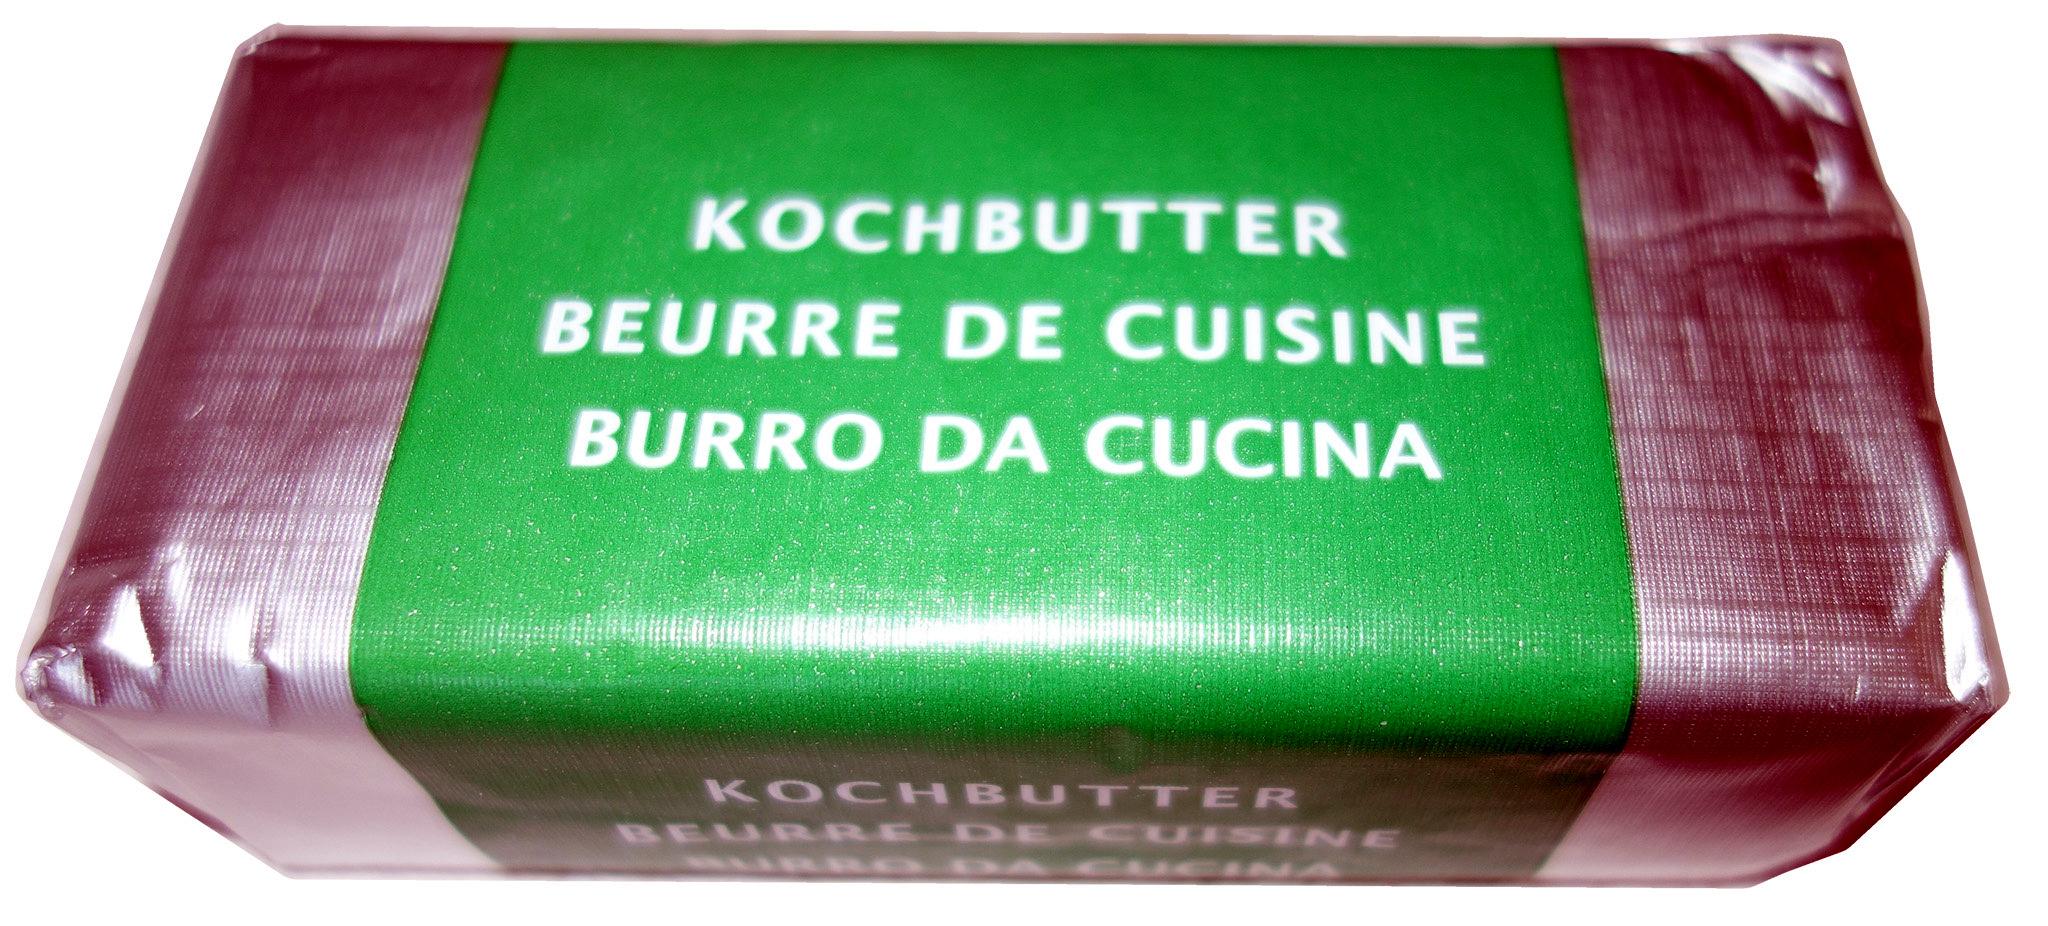 Beurre de cuisine - Product